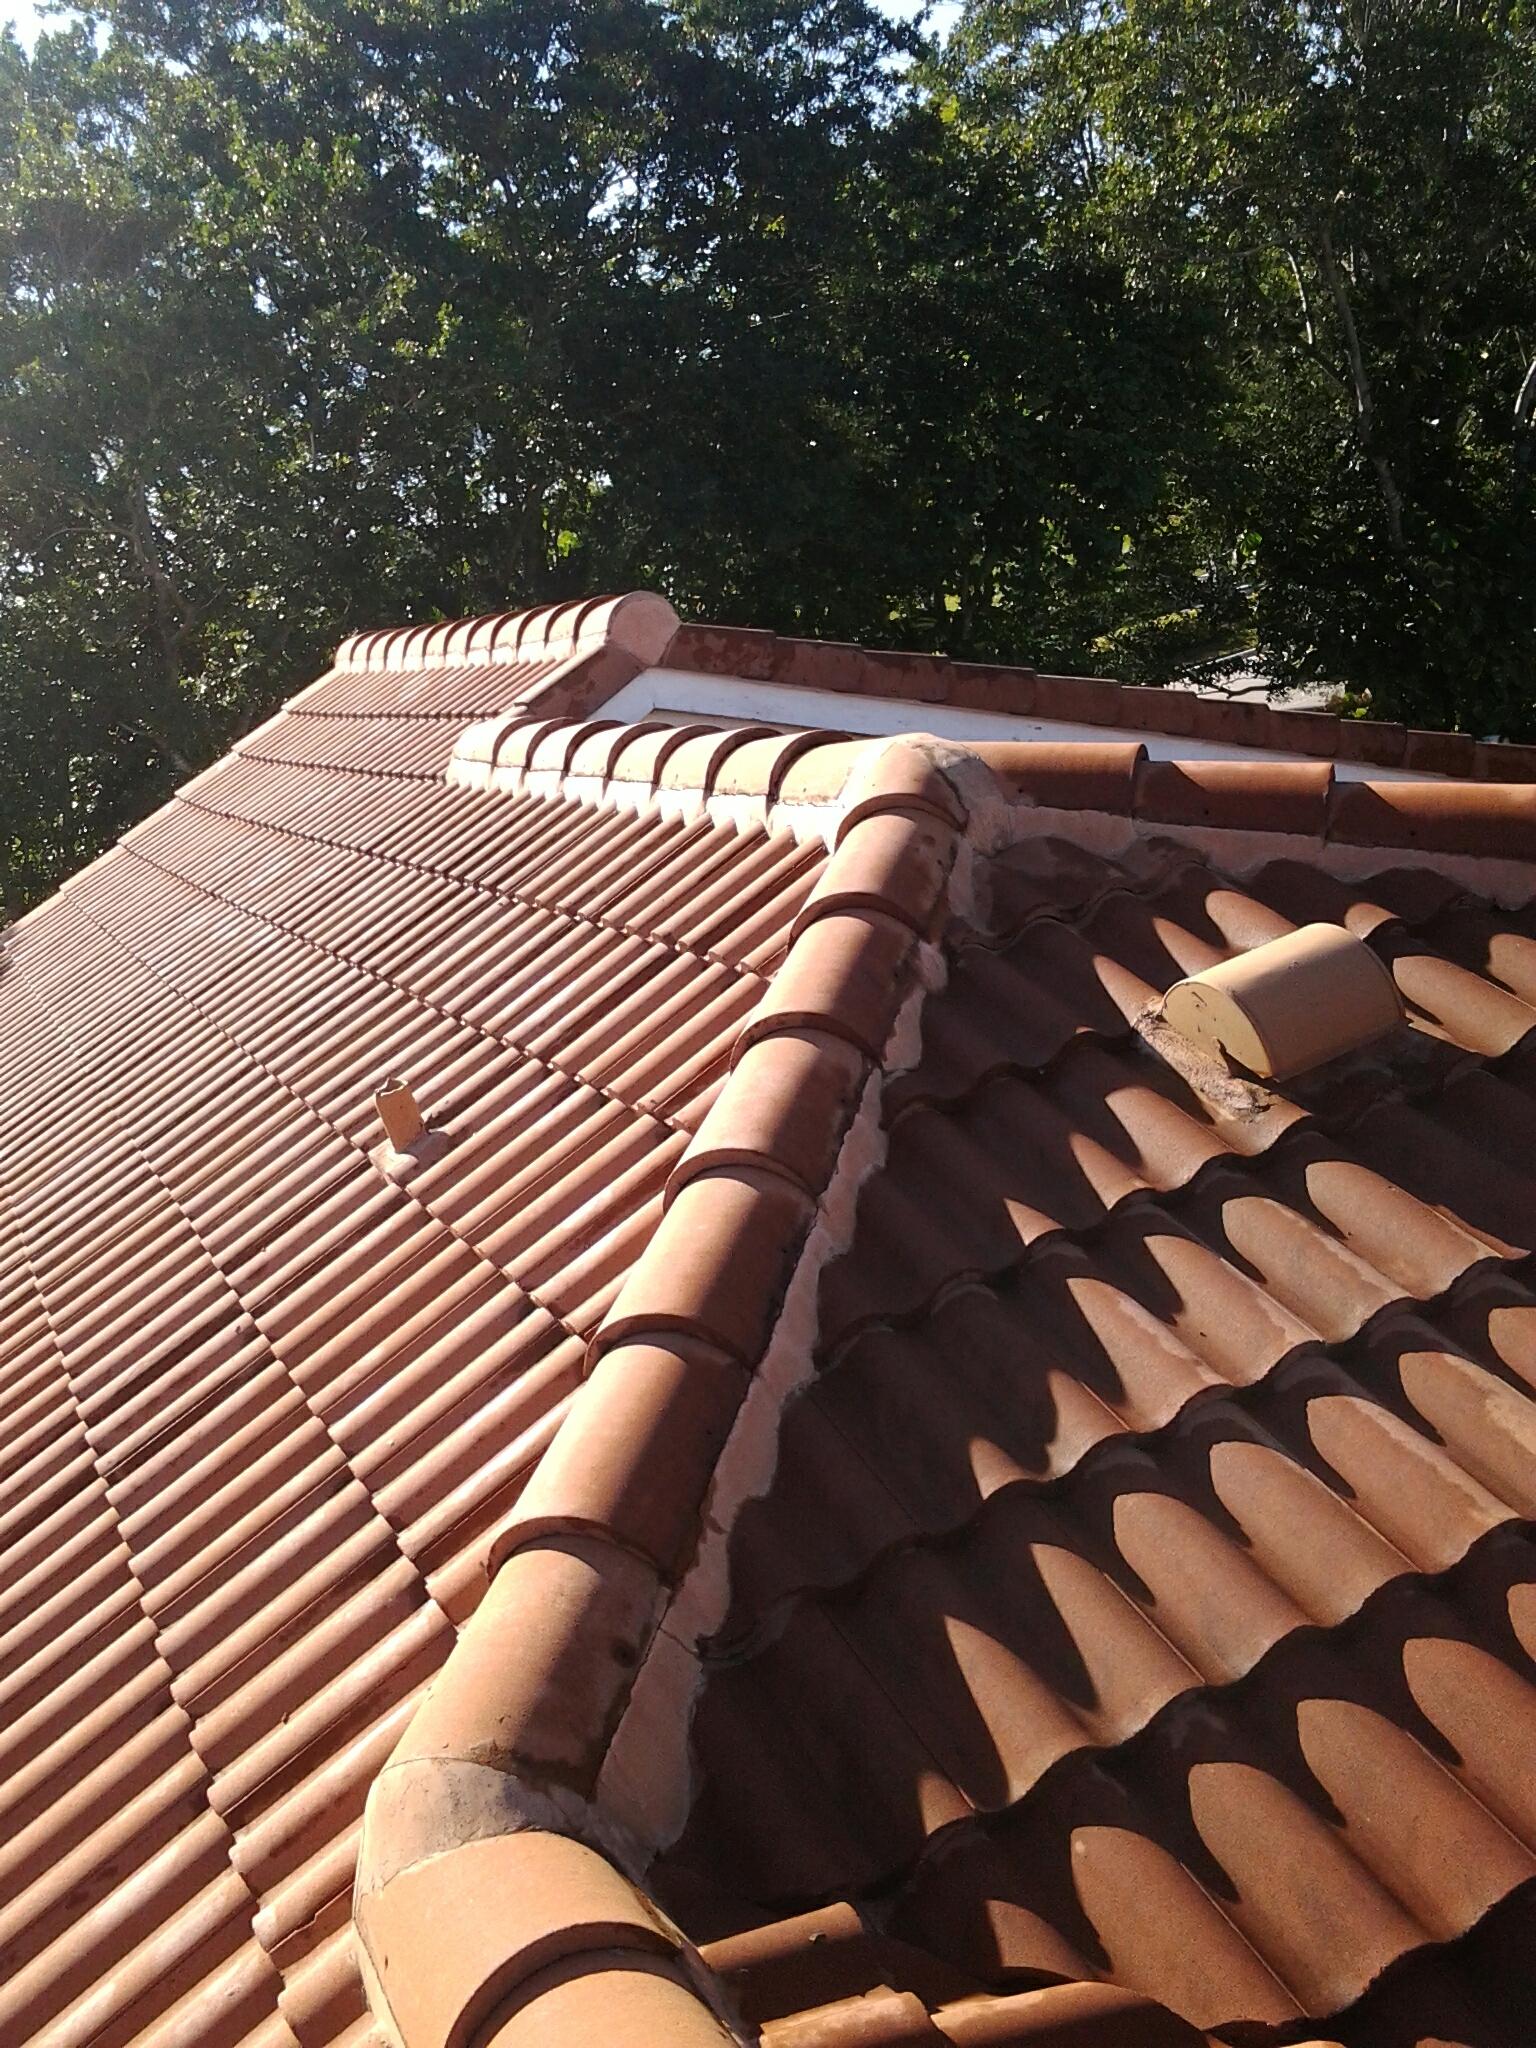 Weston, FL - Roof a cide roof